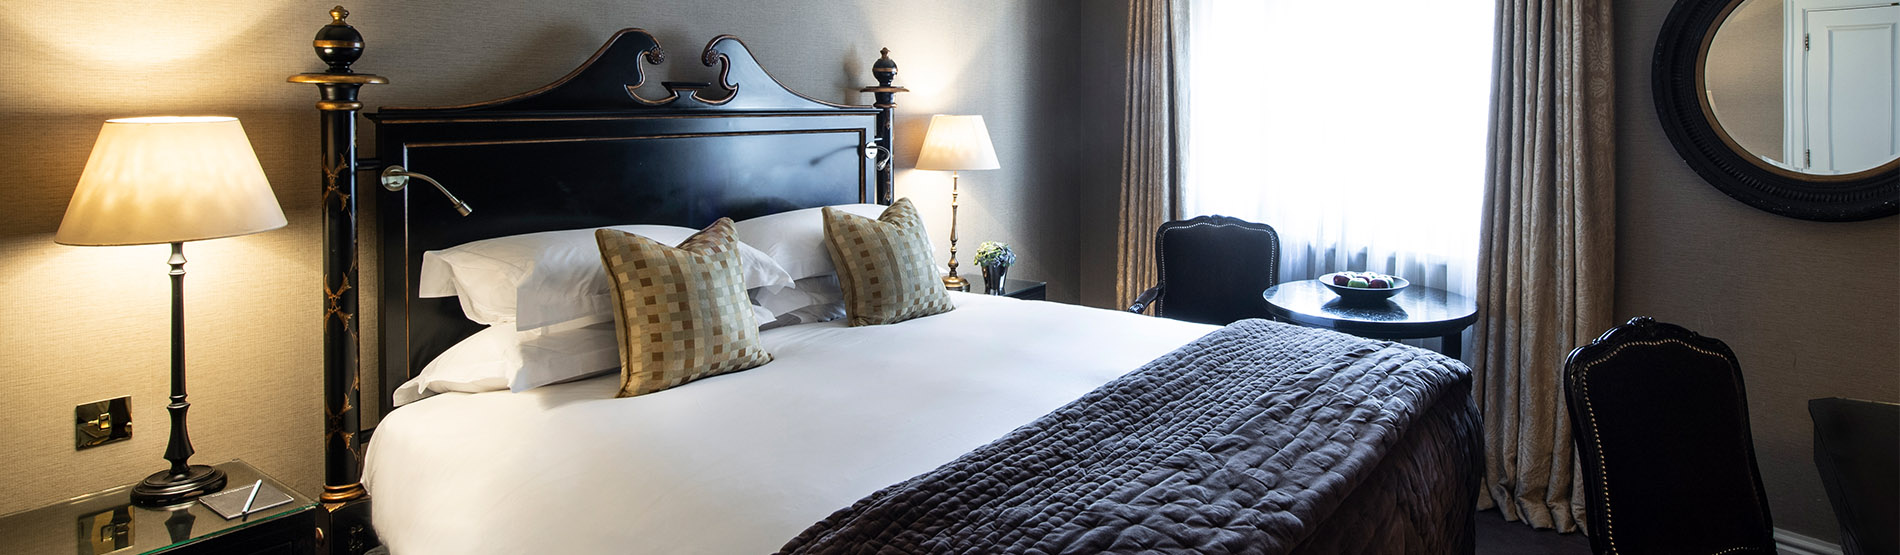 Kensington Accommodation Classic King Kensington Hotel